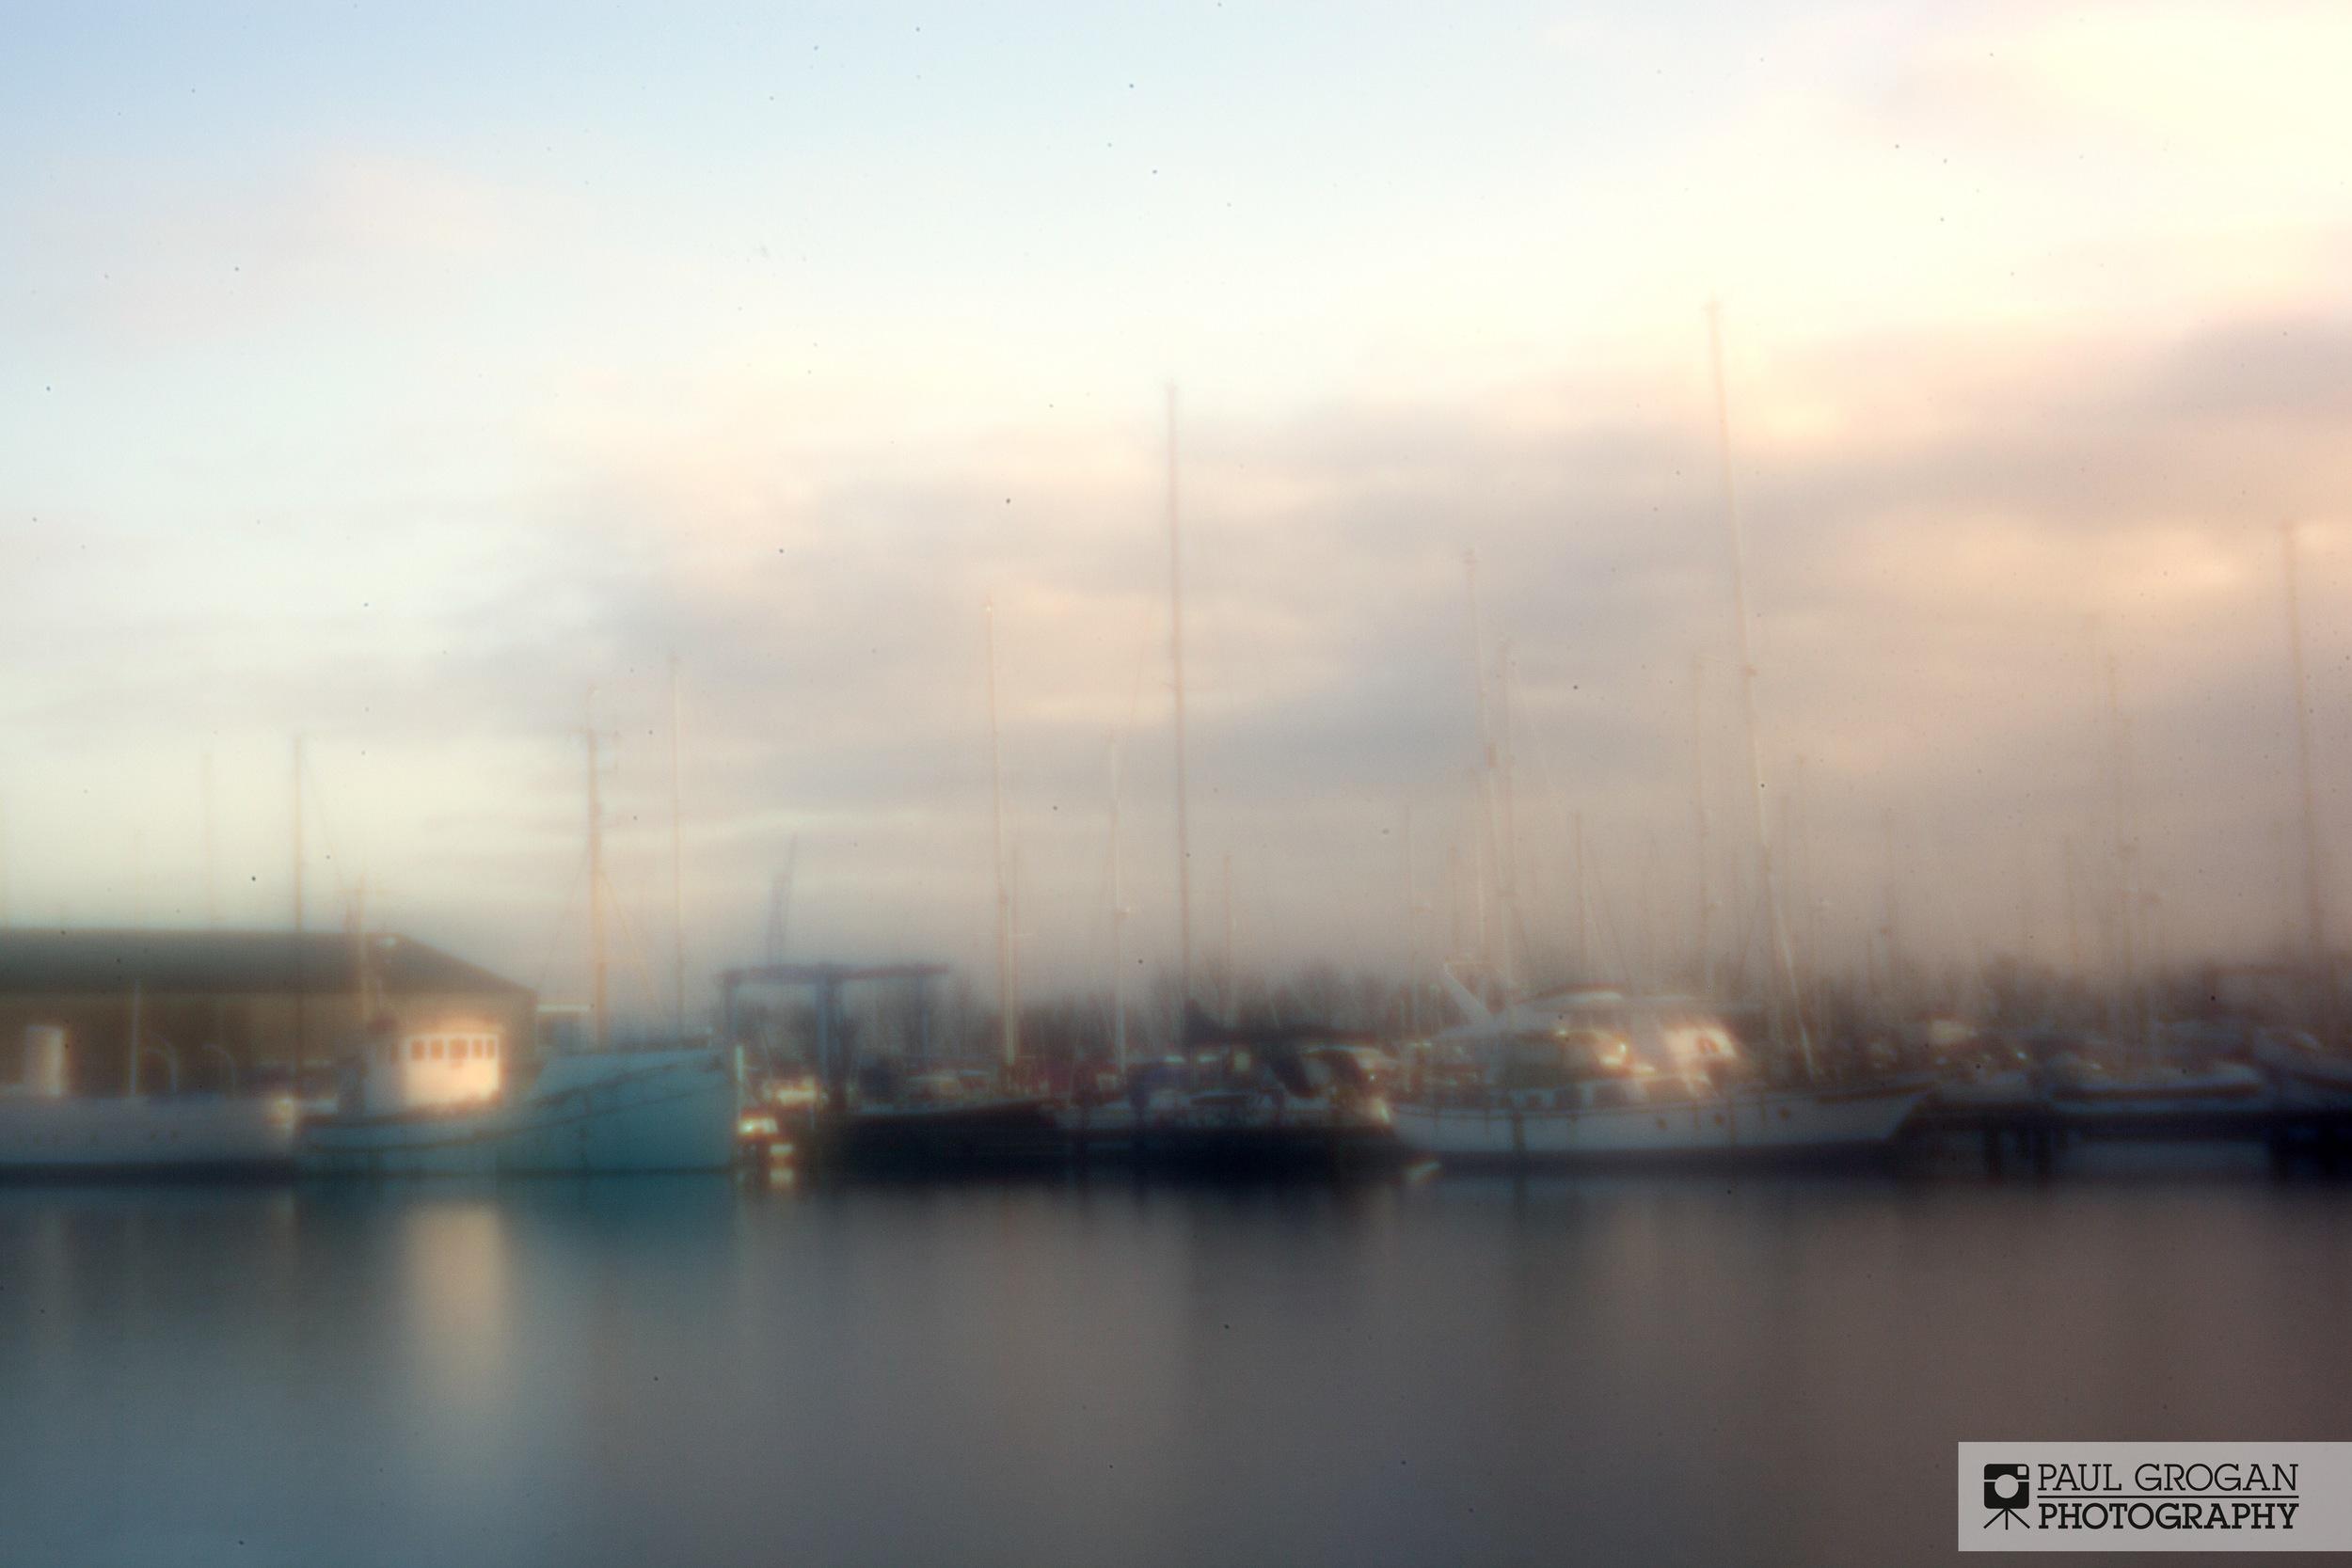 Glasson Dock Marina - Pinhole